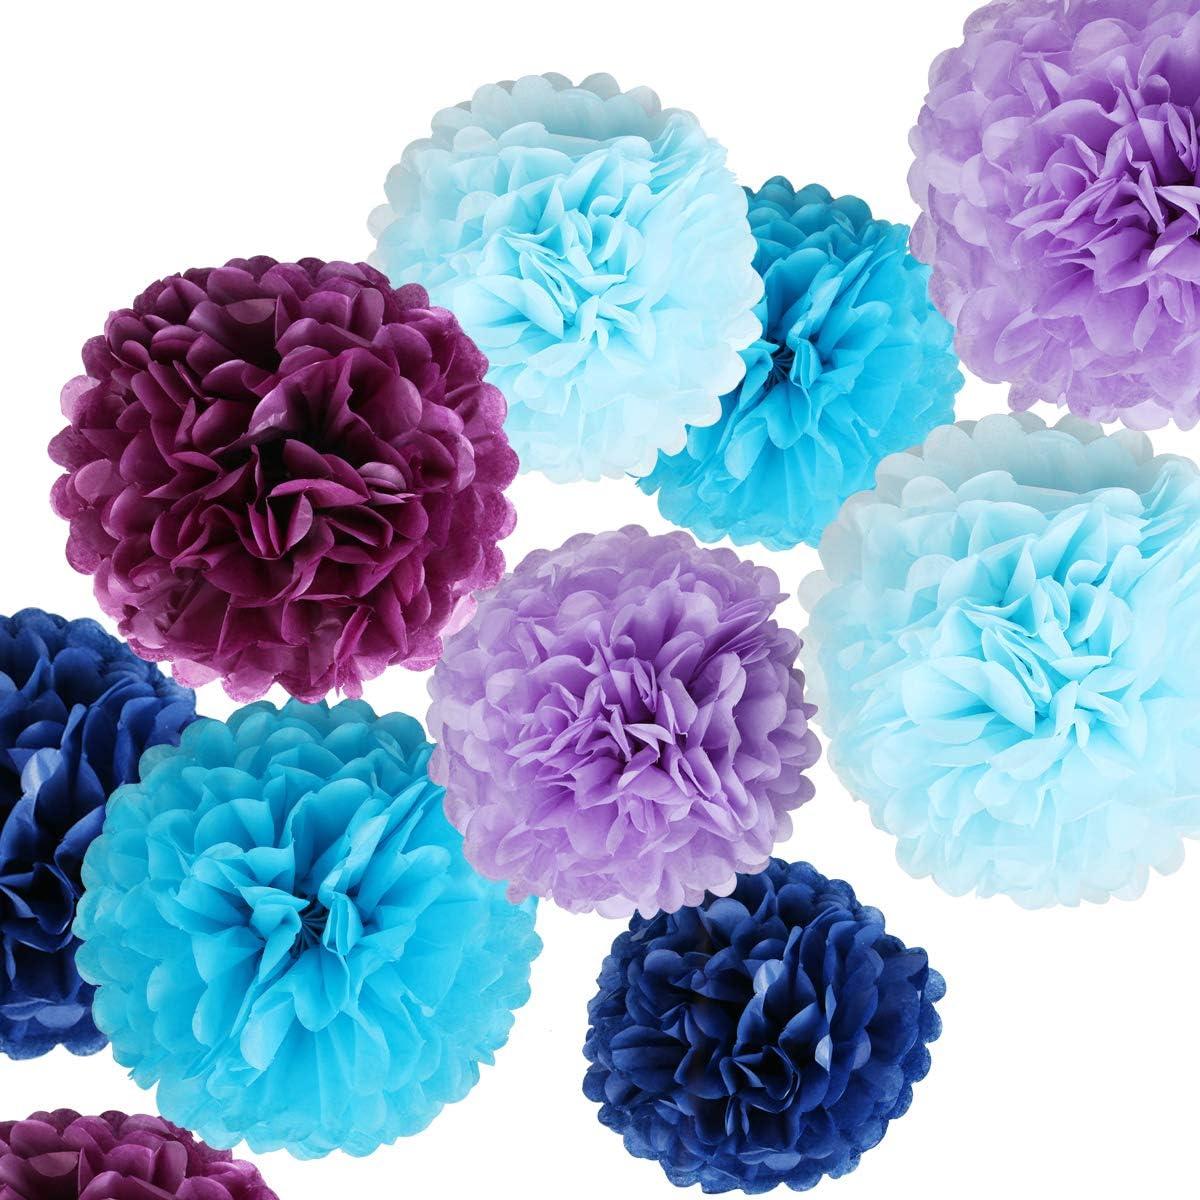 12 inch, Aqua Blue 5pcs Tissue Paper Pom-poms Robins Egg Blue Flower Ball Wedding Party Outdoor Decoration Tissue Balls Baby Shower Birthday Party Paper Ball Decor